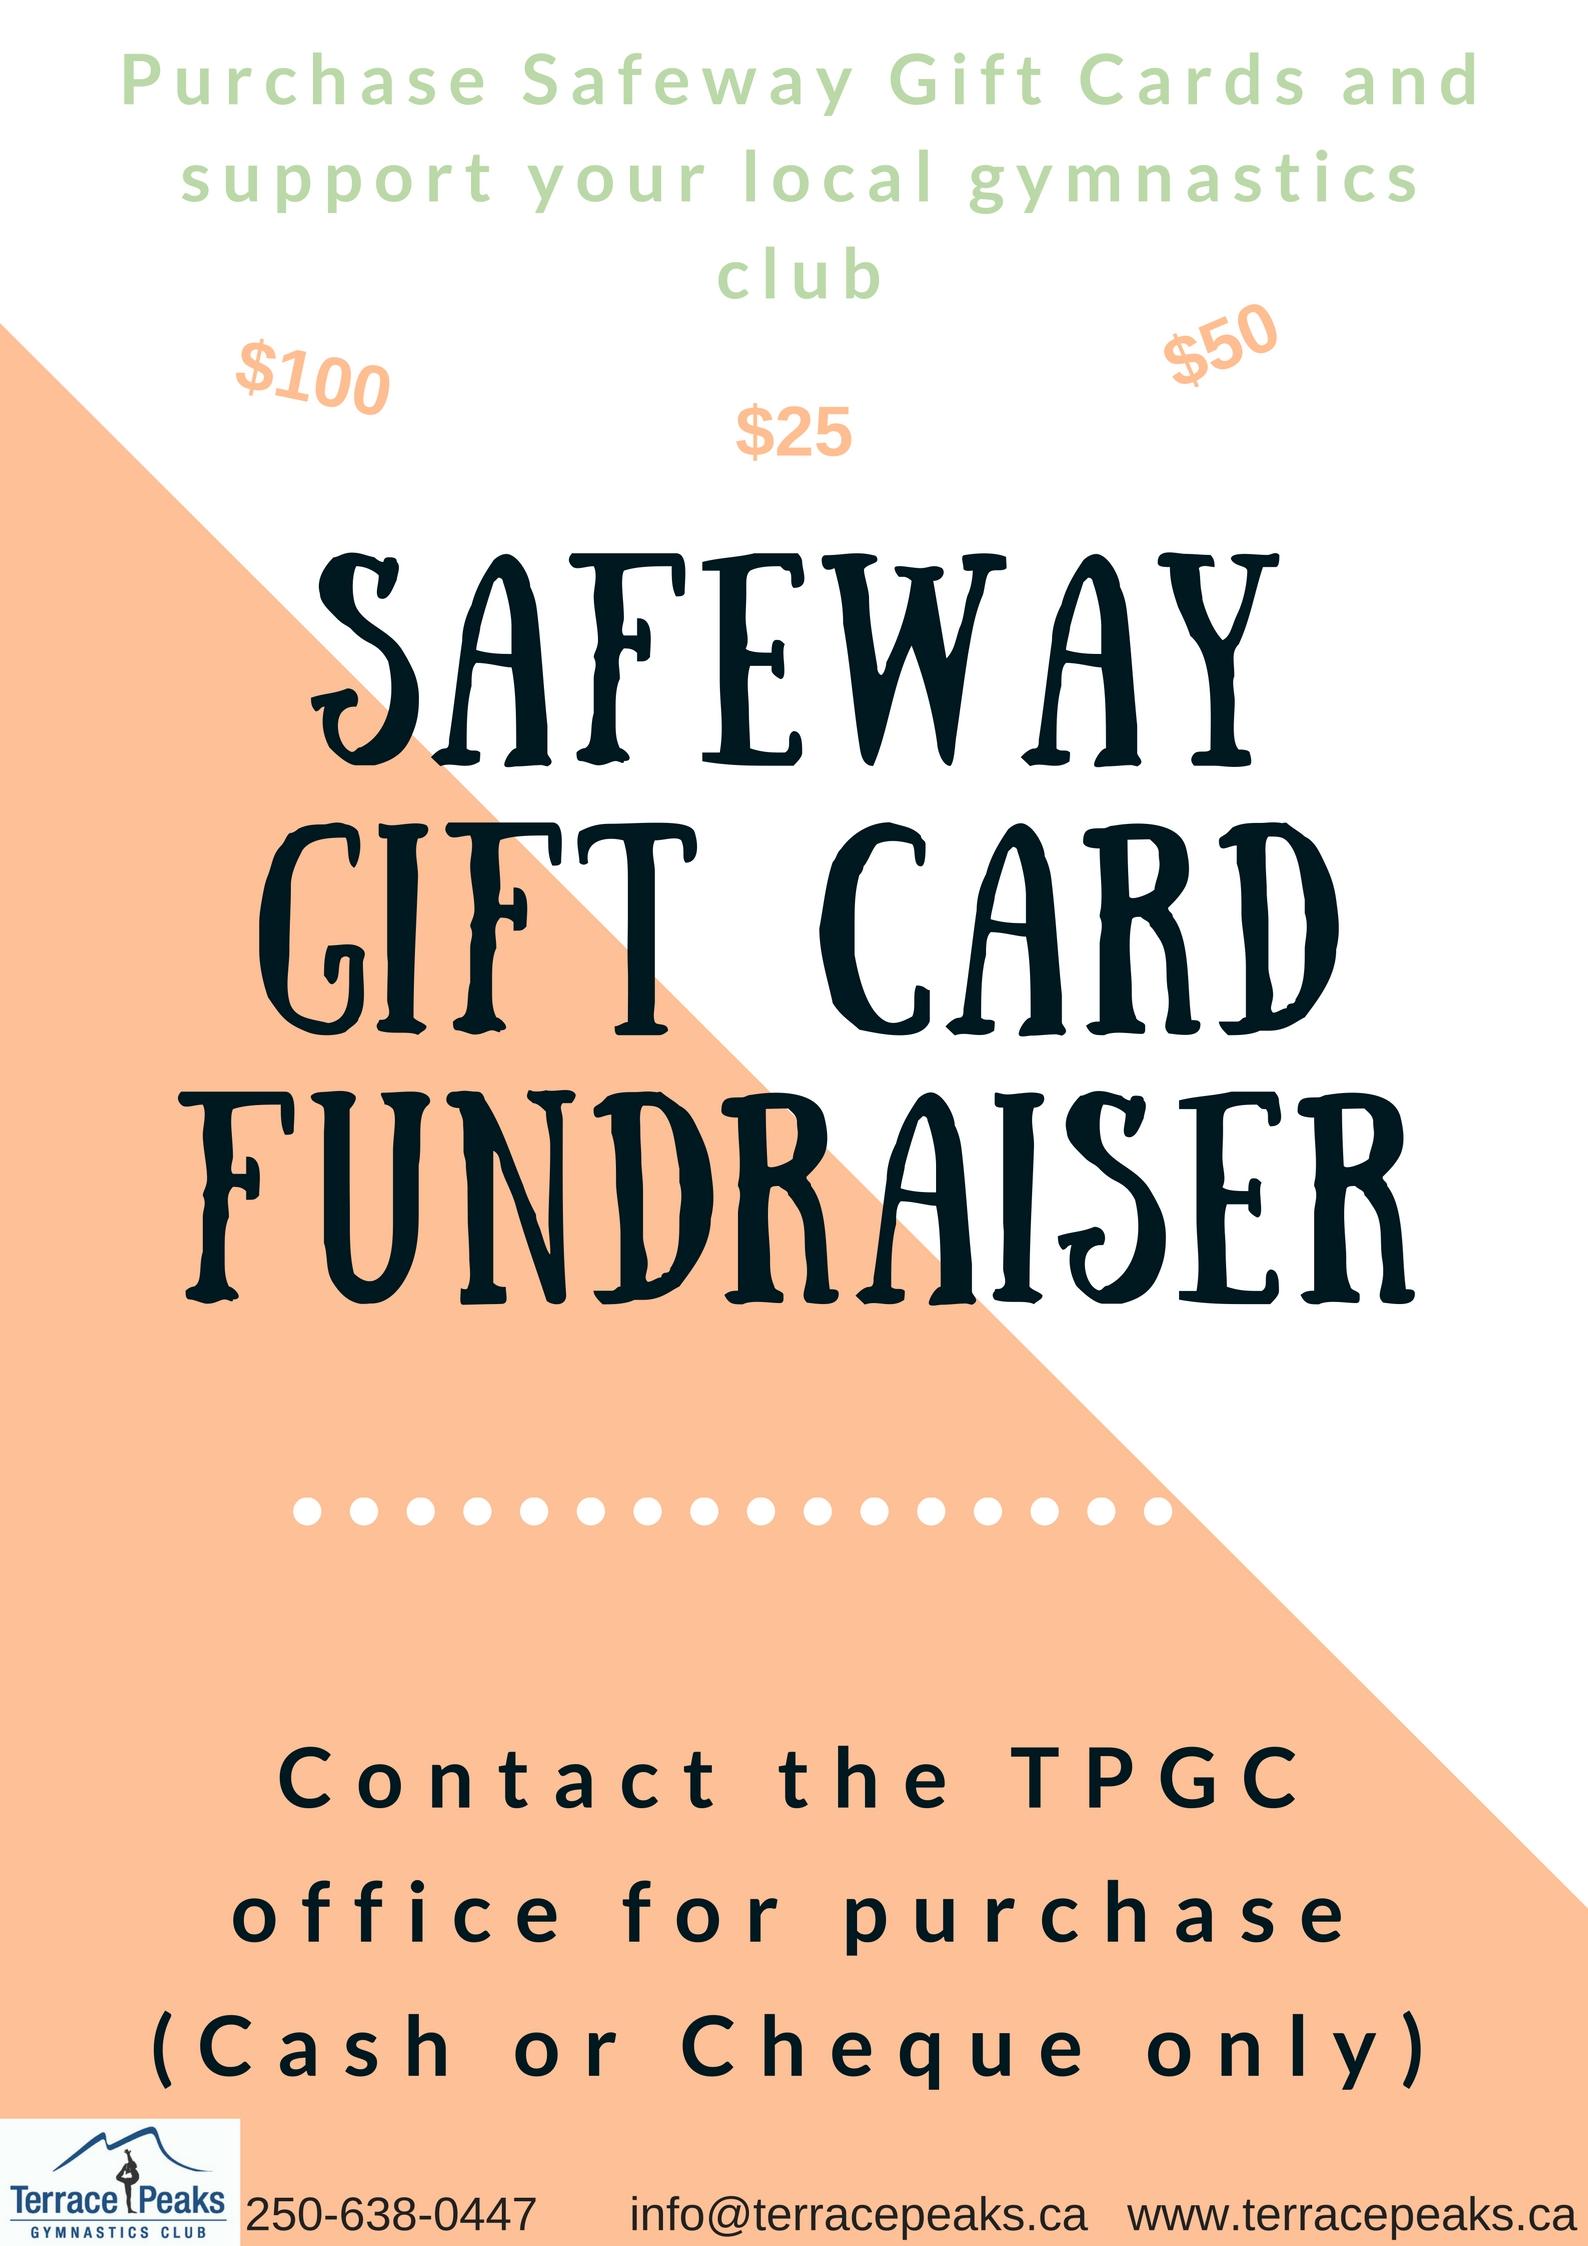 Safeway Gift Card Fundraisier – Terrace Peaks Gymnastics Club